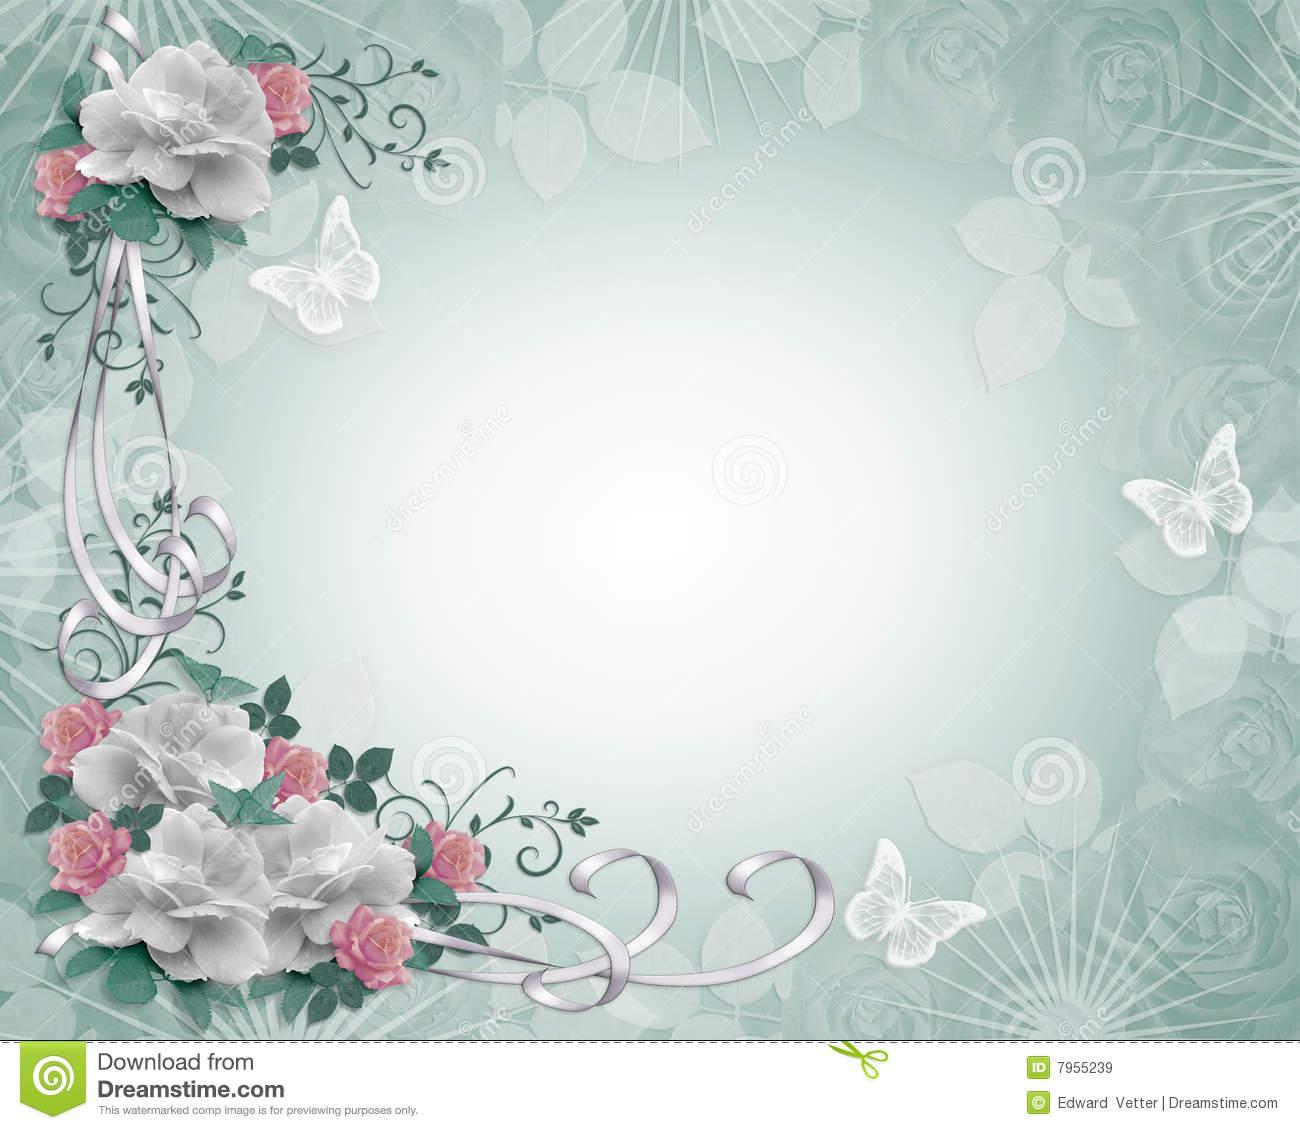 Free Download Email Background Image For Wedding Invitation Broprahshow 1300x1130 For Your Desktop Mobile Tablet Explore 71 Free Wedding Background Images Wedding Wallpaper Images